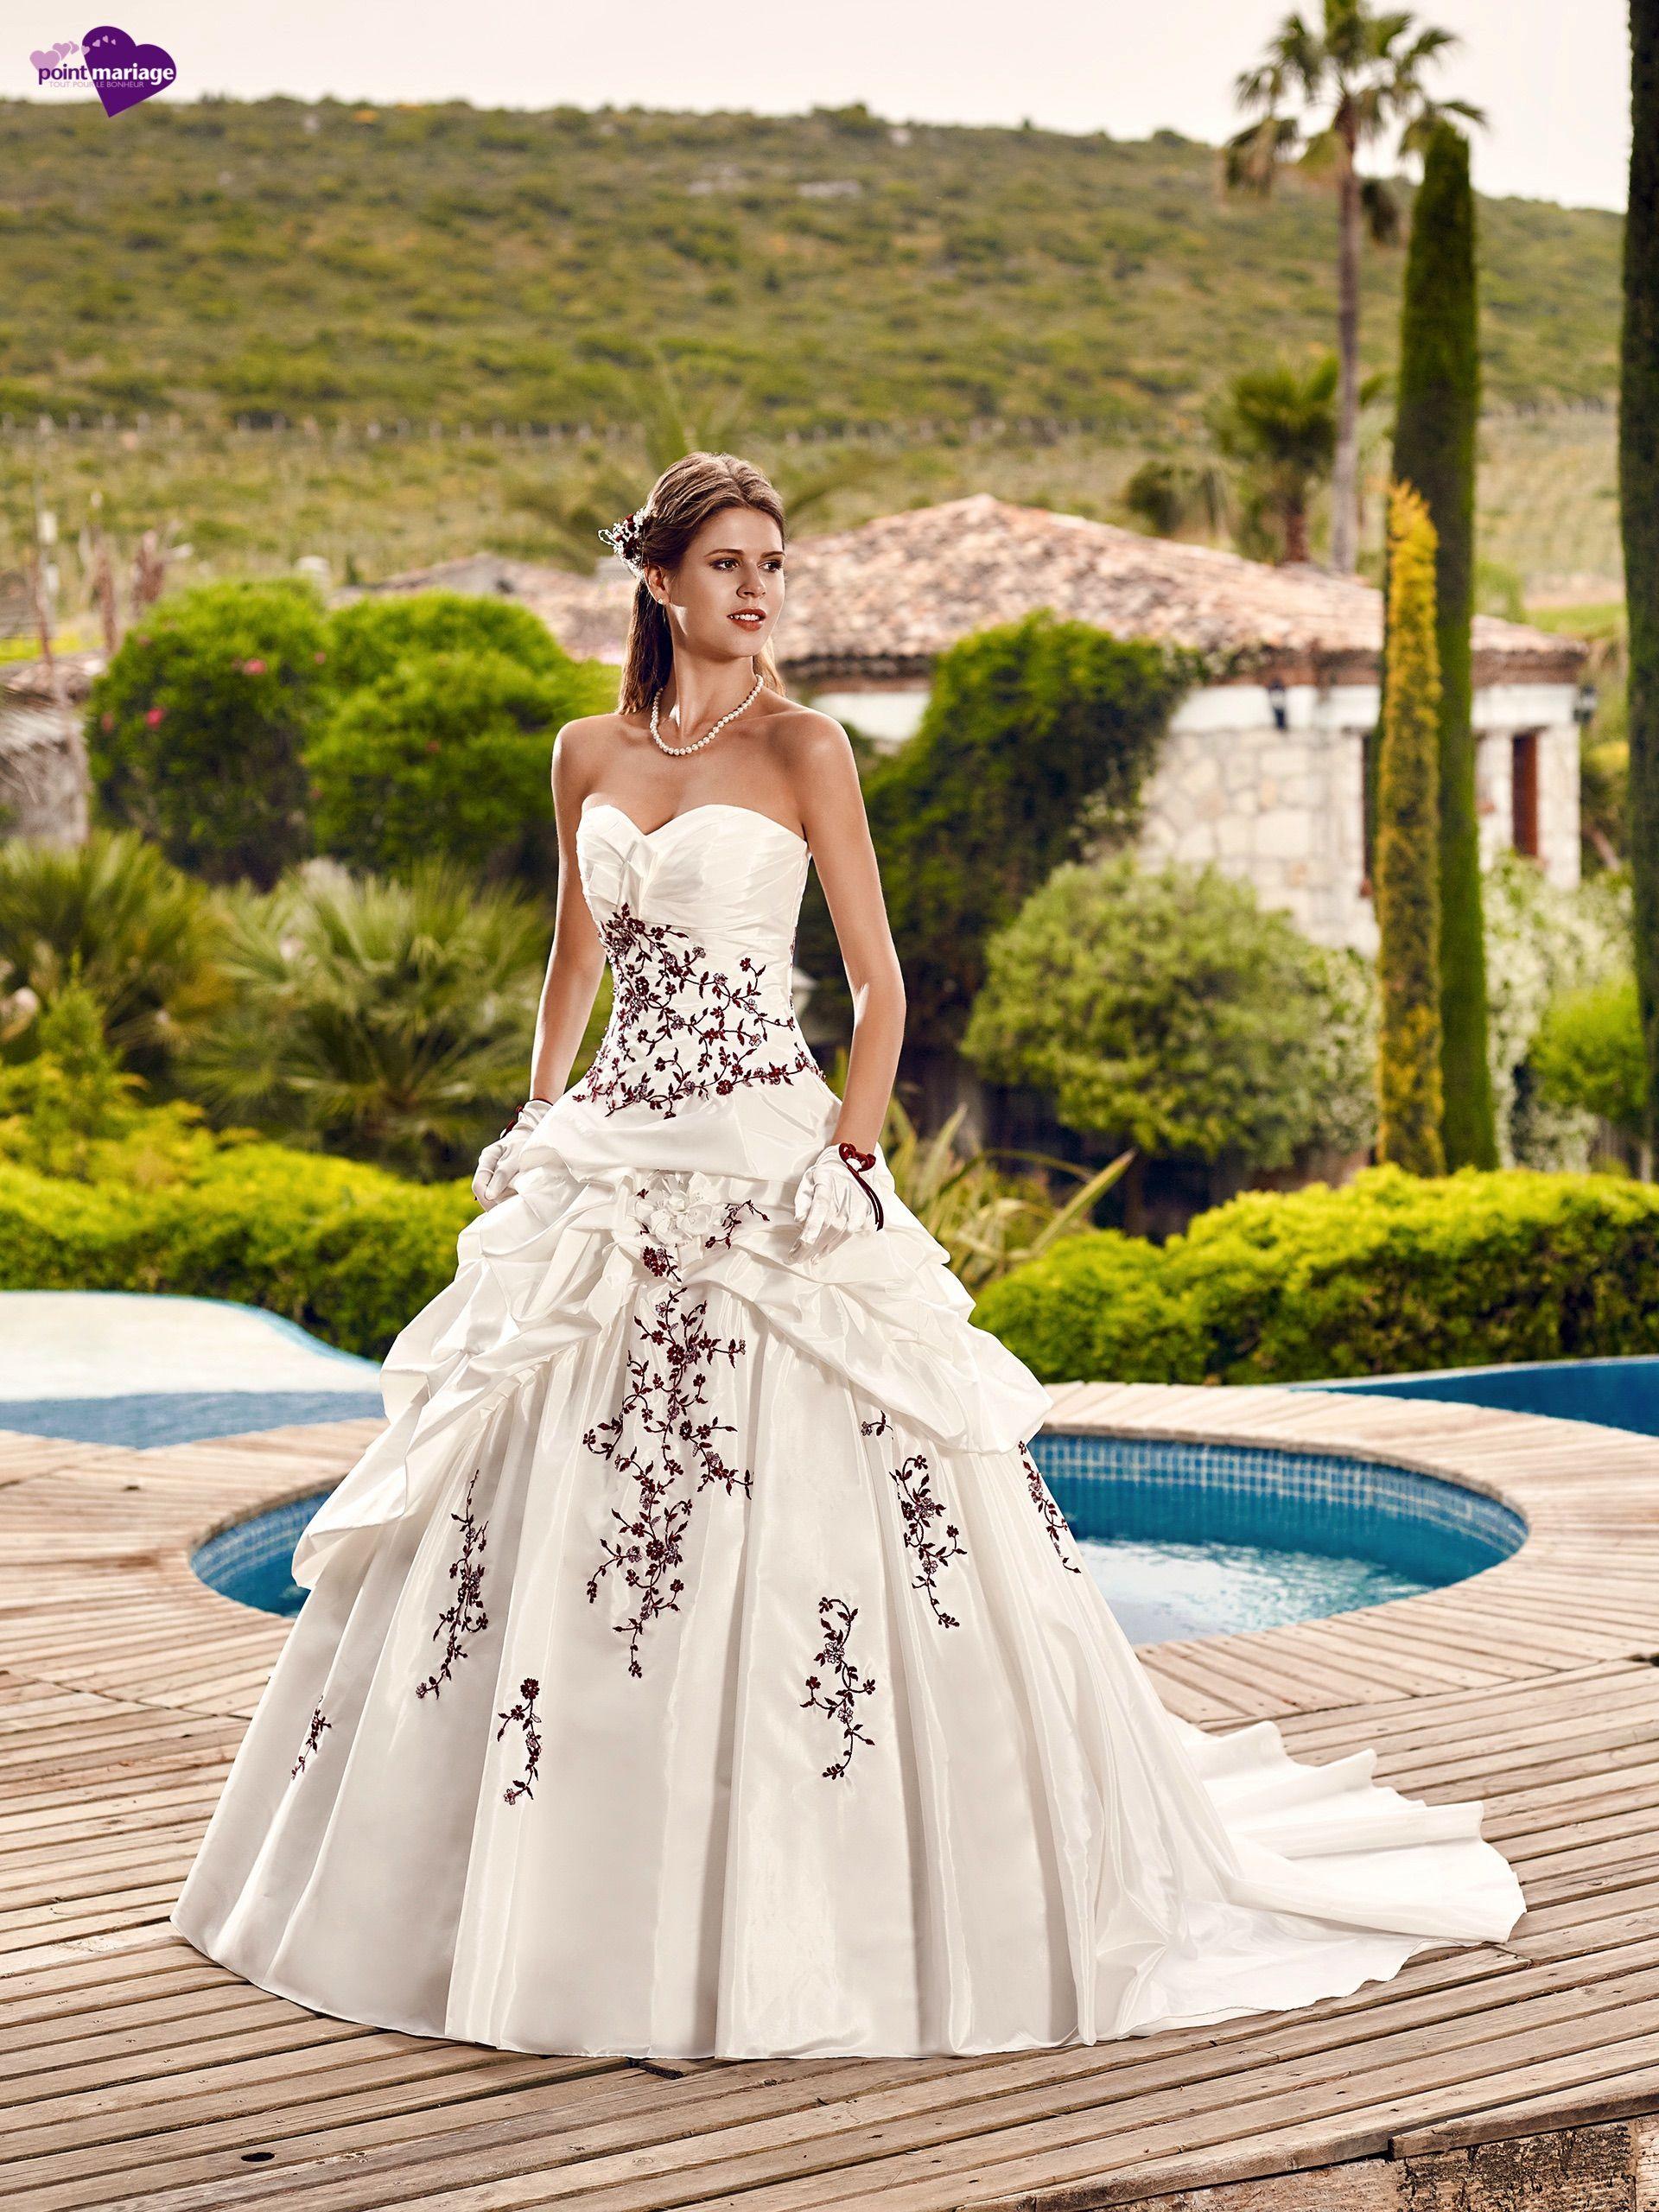 épinglé Par Tracey Purdue Sur Weddings En 2019 Robe Robe